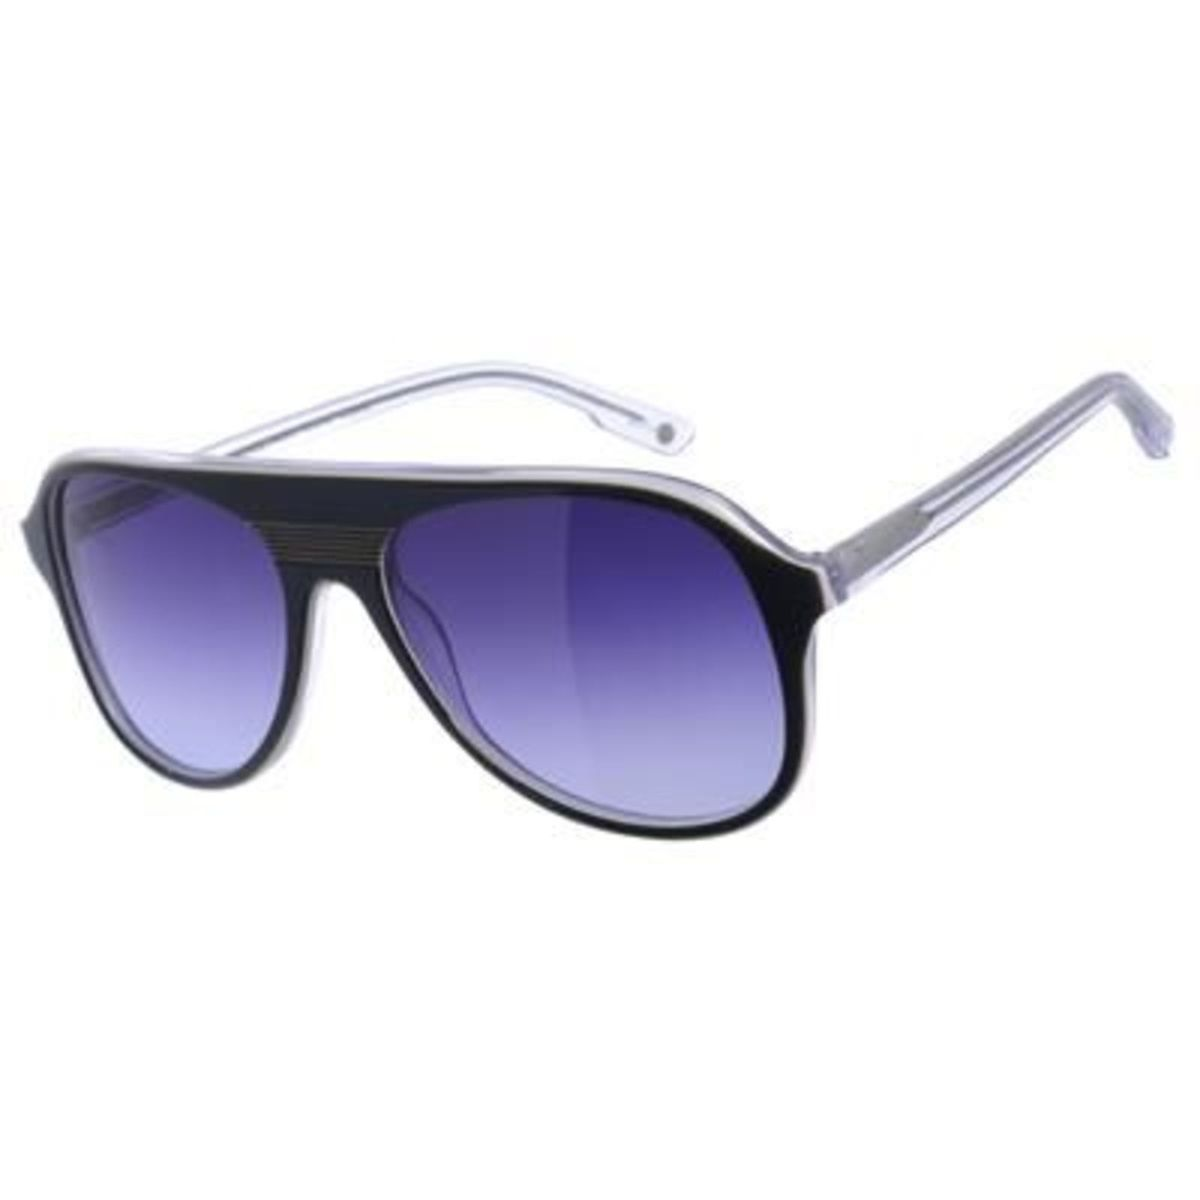 f5d8f2ab7 Óculos Oculos Chilli Beans By Ronaldo Fraga   Óculos Masculino Chilli Beans  Nunca Usado 774487   enjoei